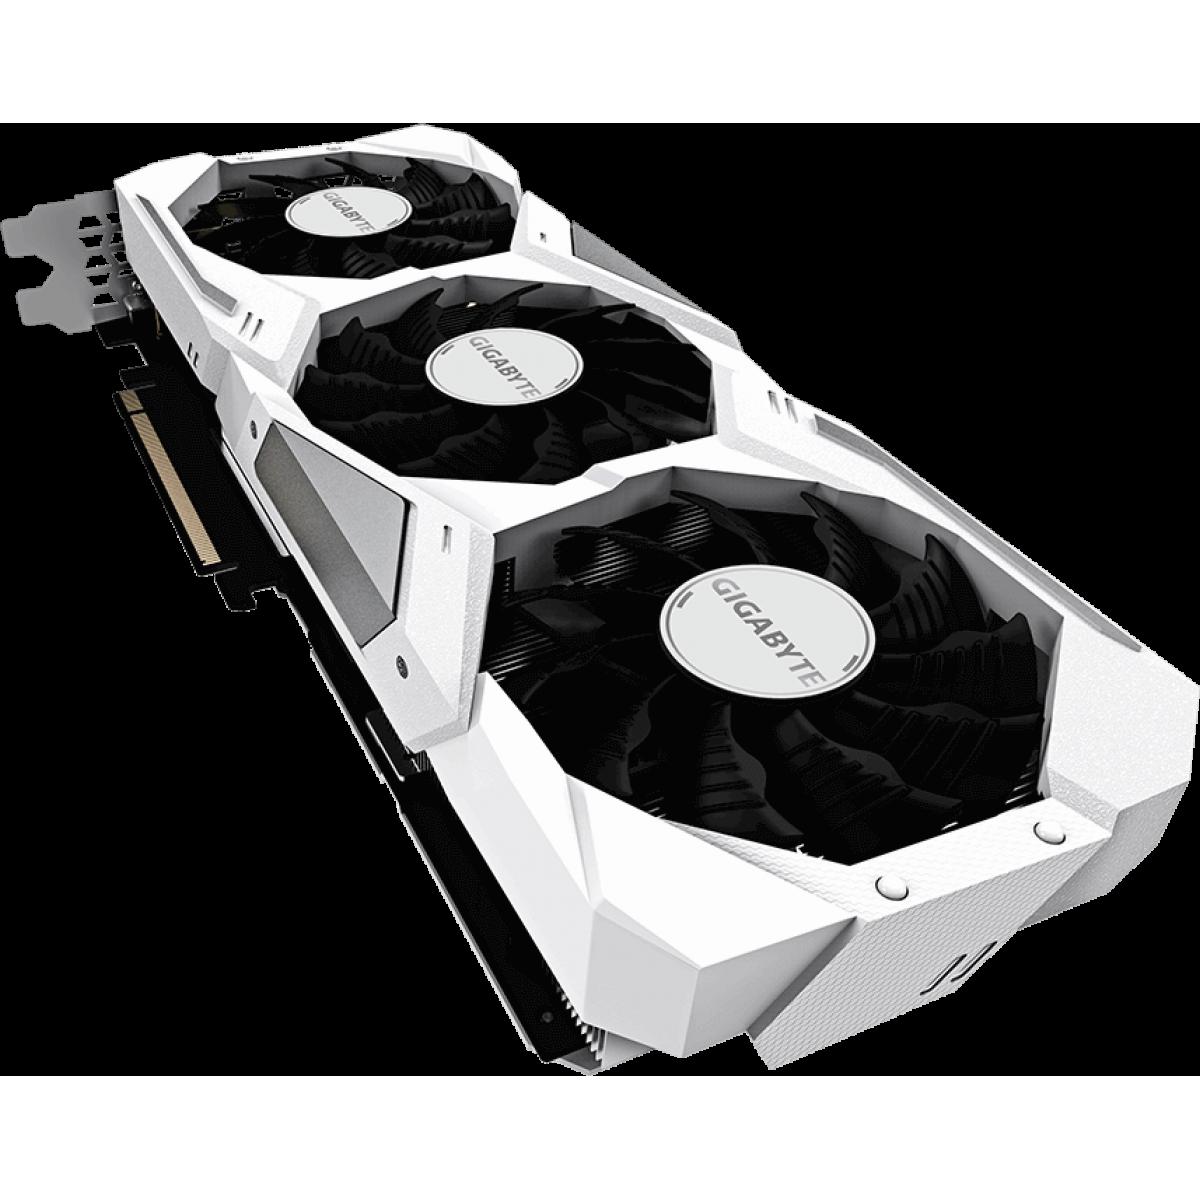 Placa De Vídeo Gigabyte Geforce RTX 2080 Gaming OC White, 8GB GDDR6, 256Bit, GV-N2080GAMINGOC-WHITE-8GC